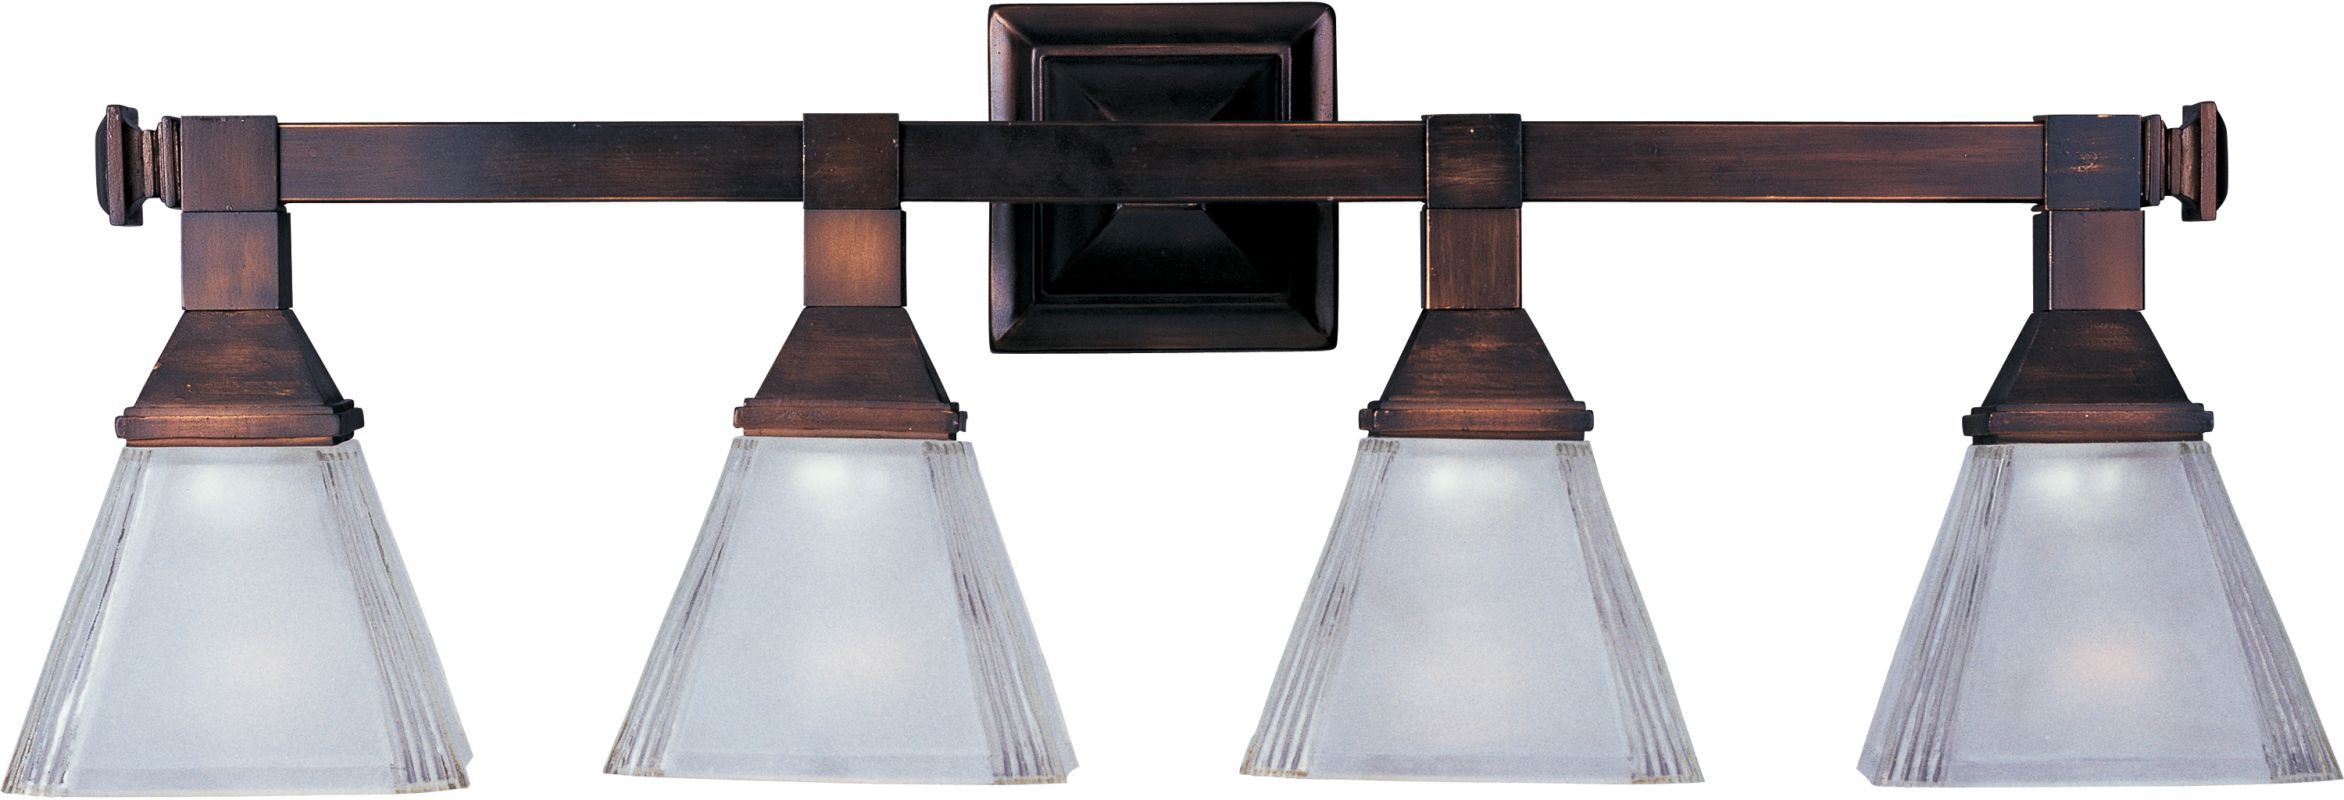 New 4 Light Bathroom Vanity Lighting Fixture Bronze: Maxim 11079FTOI Oil Rubbed Bronze / Frosted Glass 4 Light